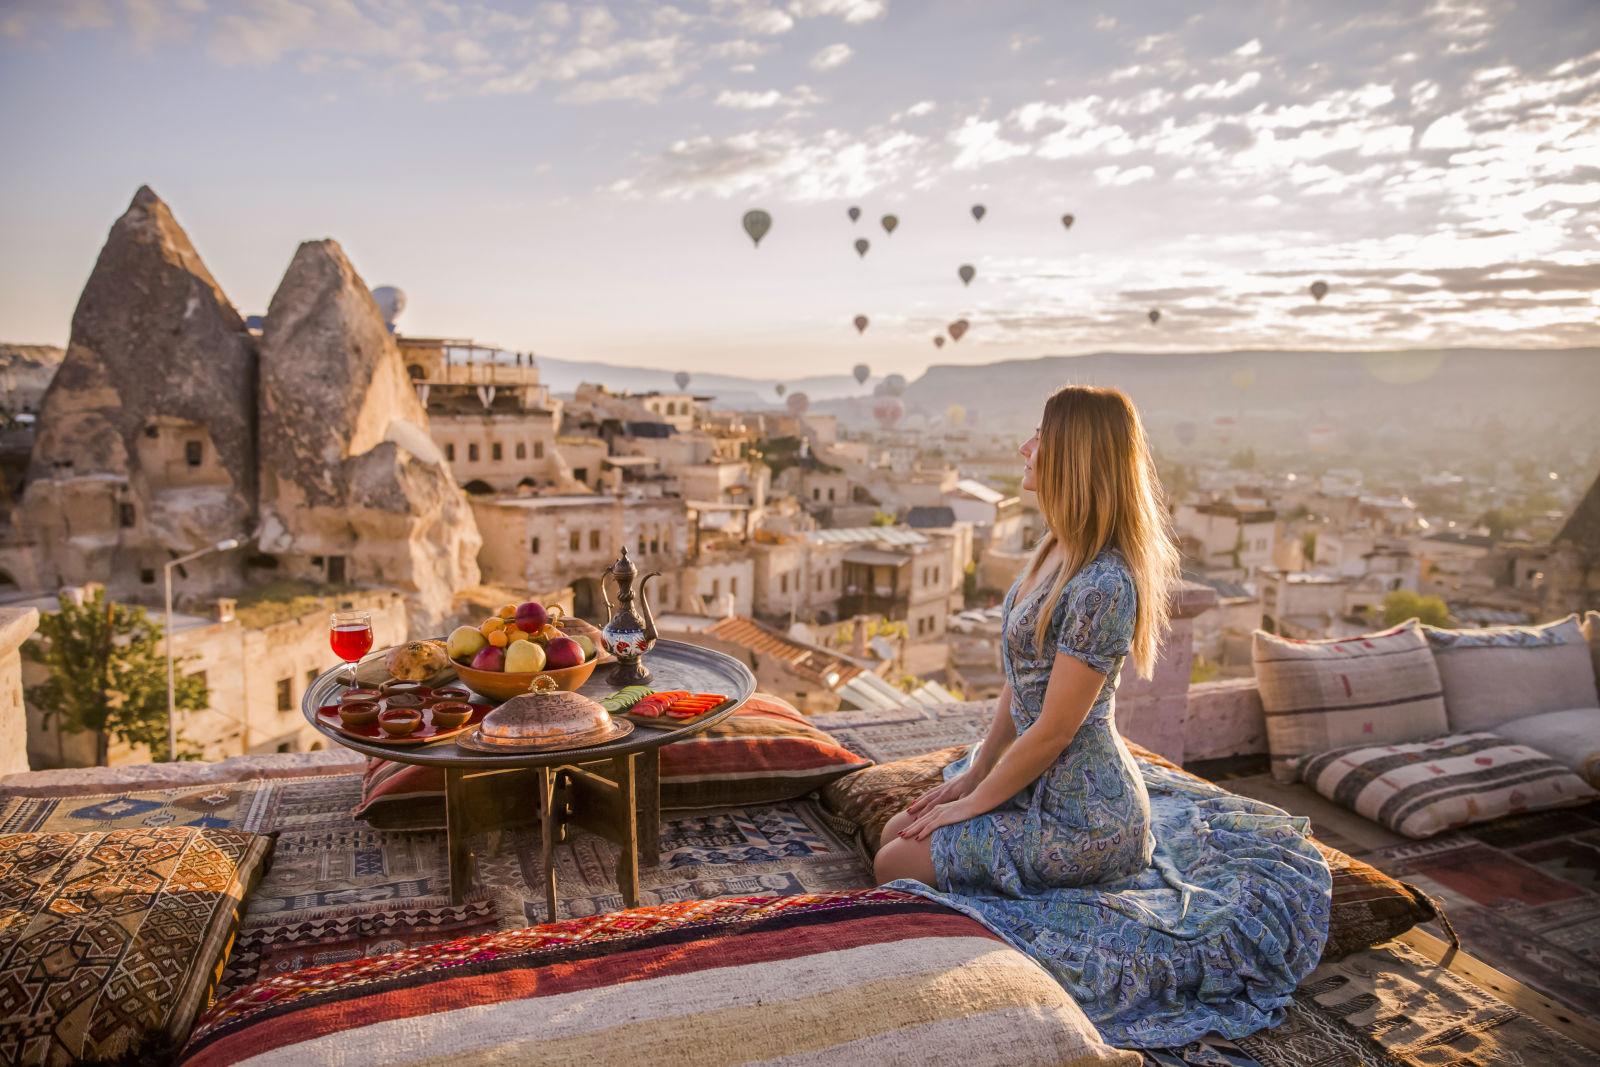 Cappadocia, Clothing, Person